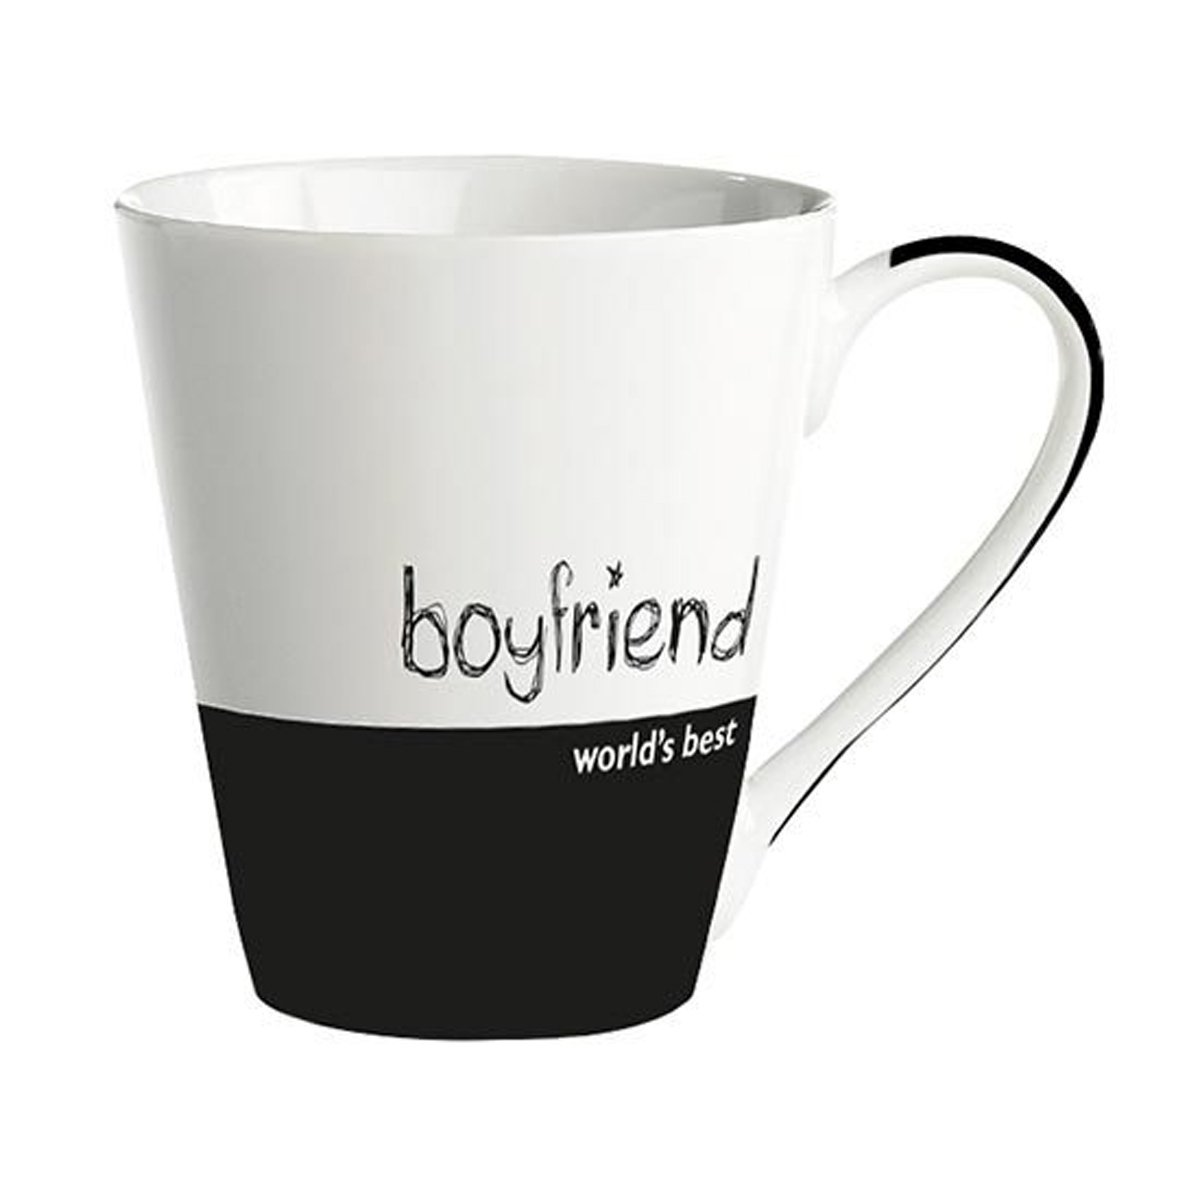 Taza de porcelana blanca y negra boyfriend sears com mx for Tazas de porcelana